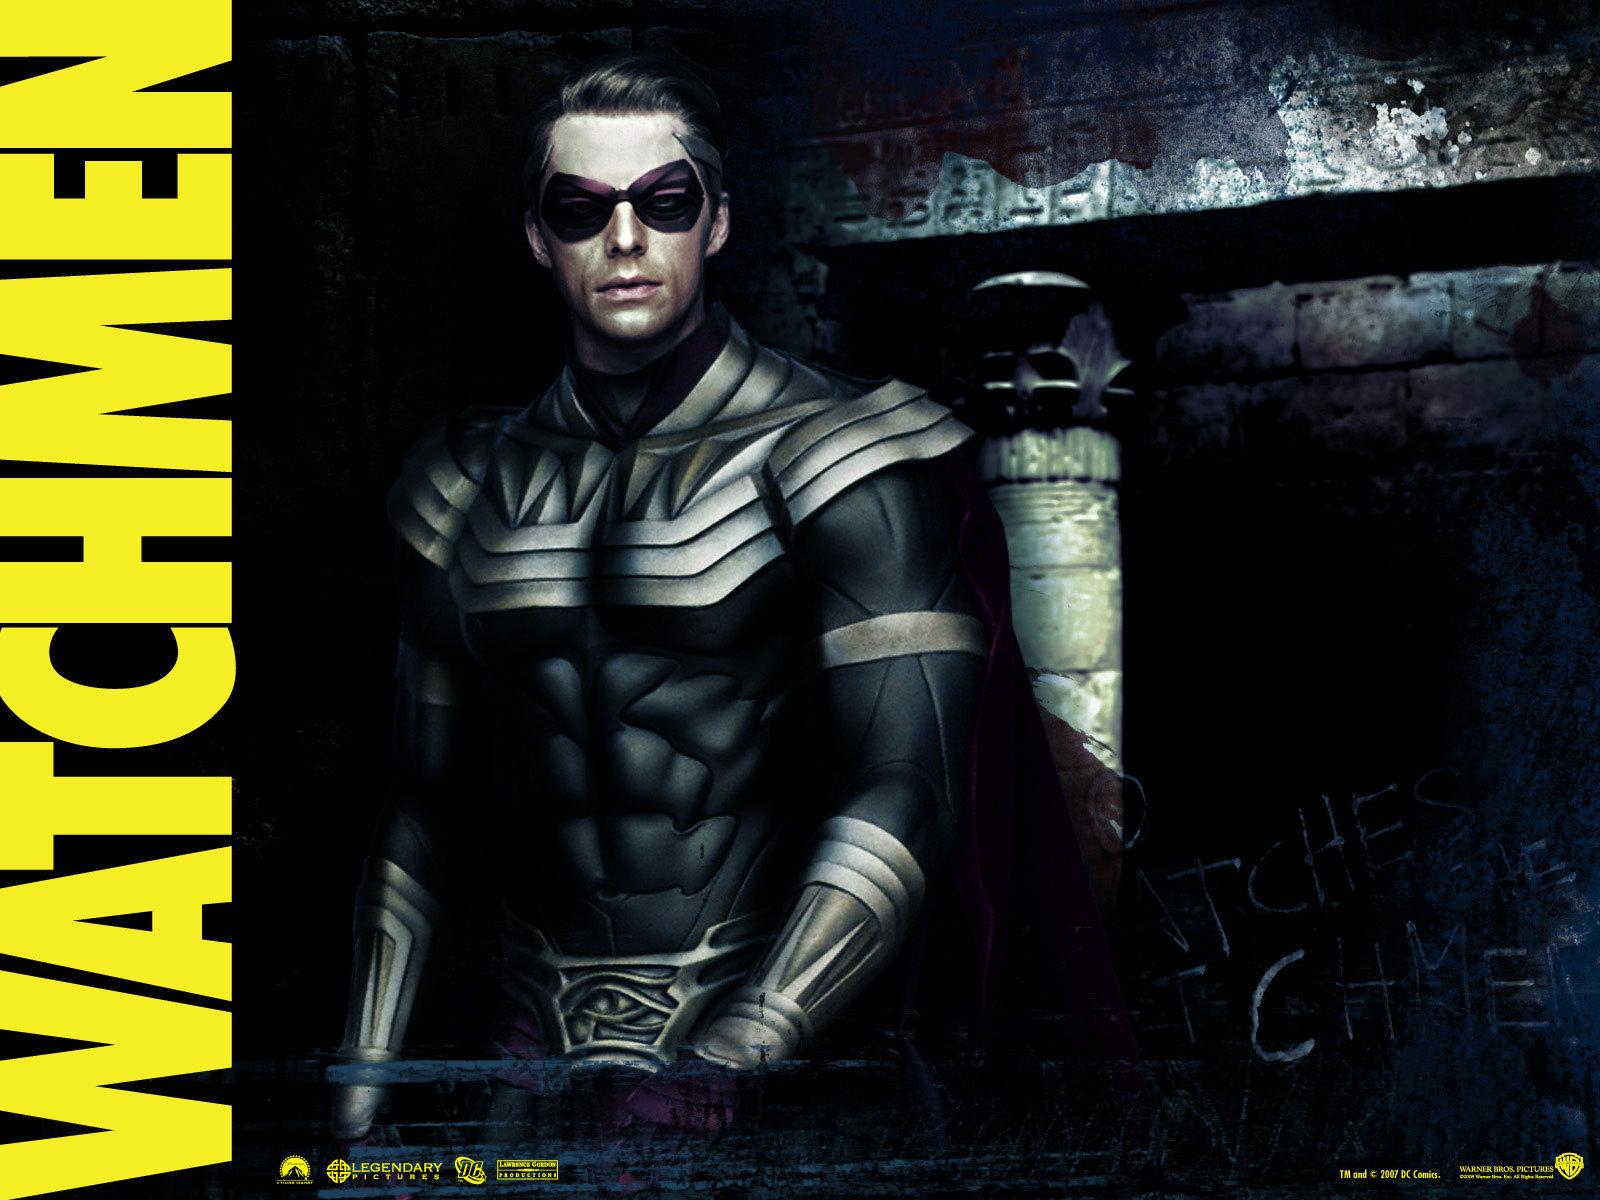 Official watchmen movie